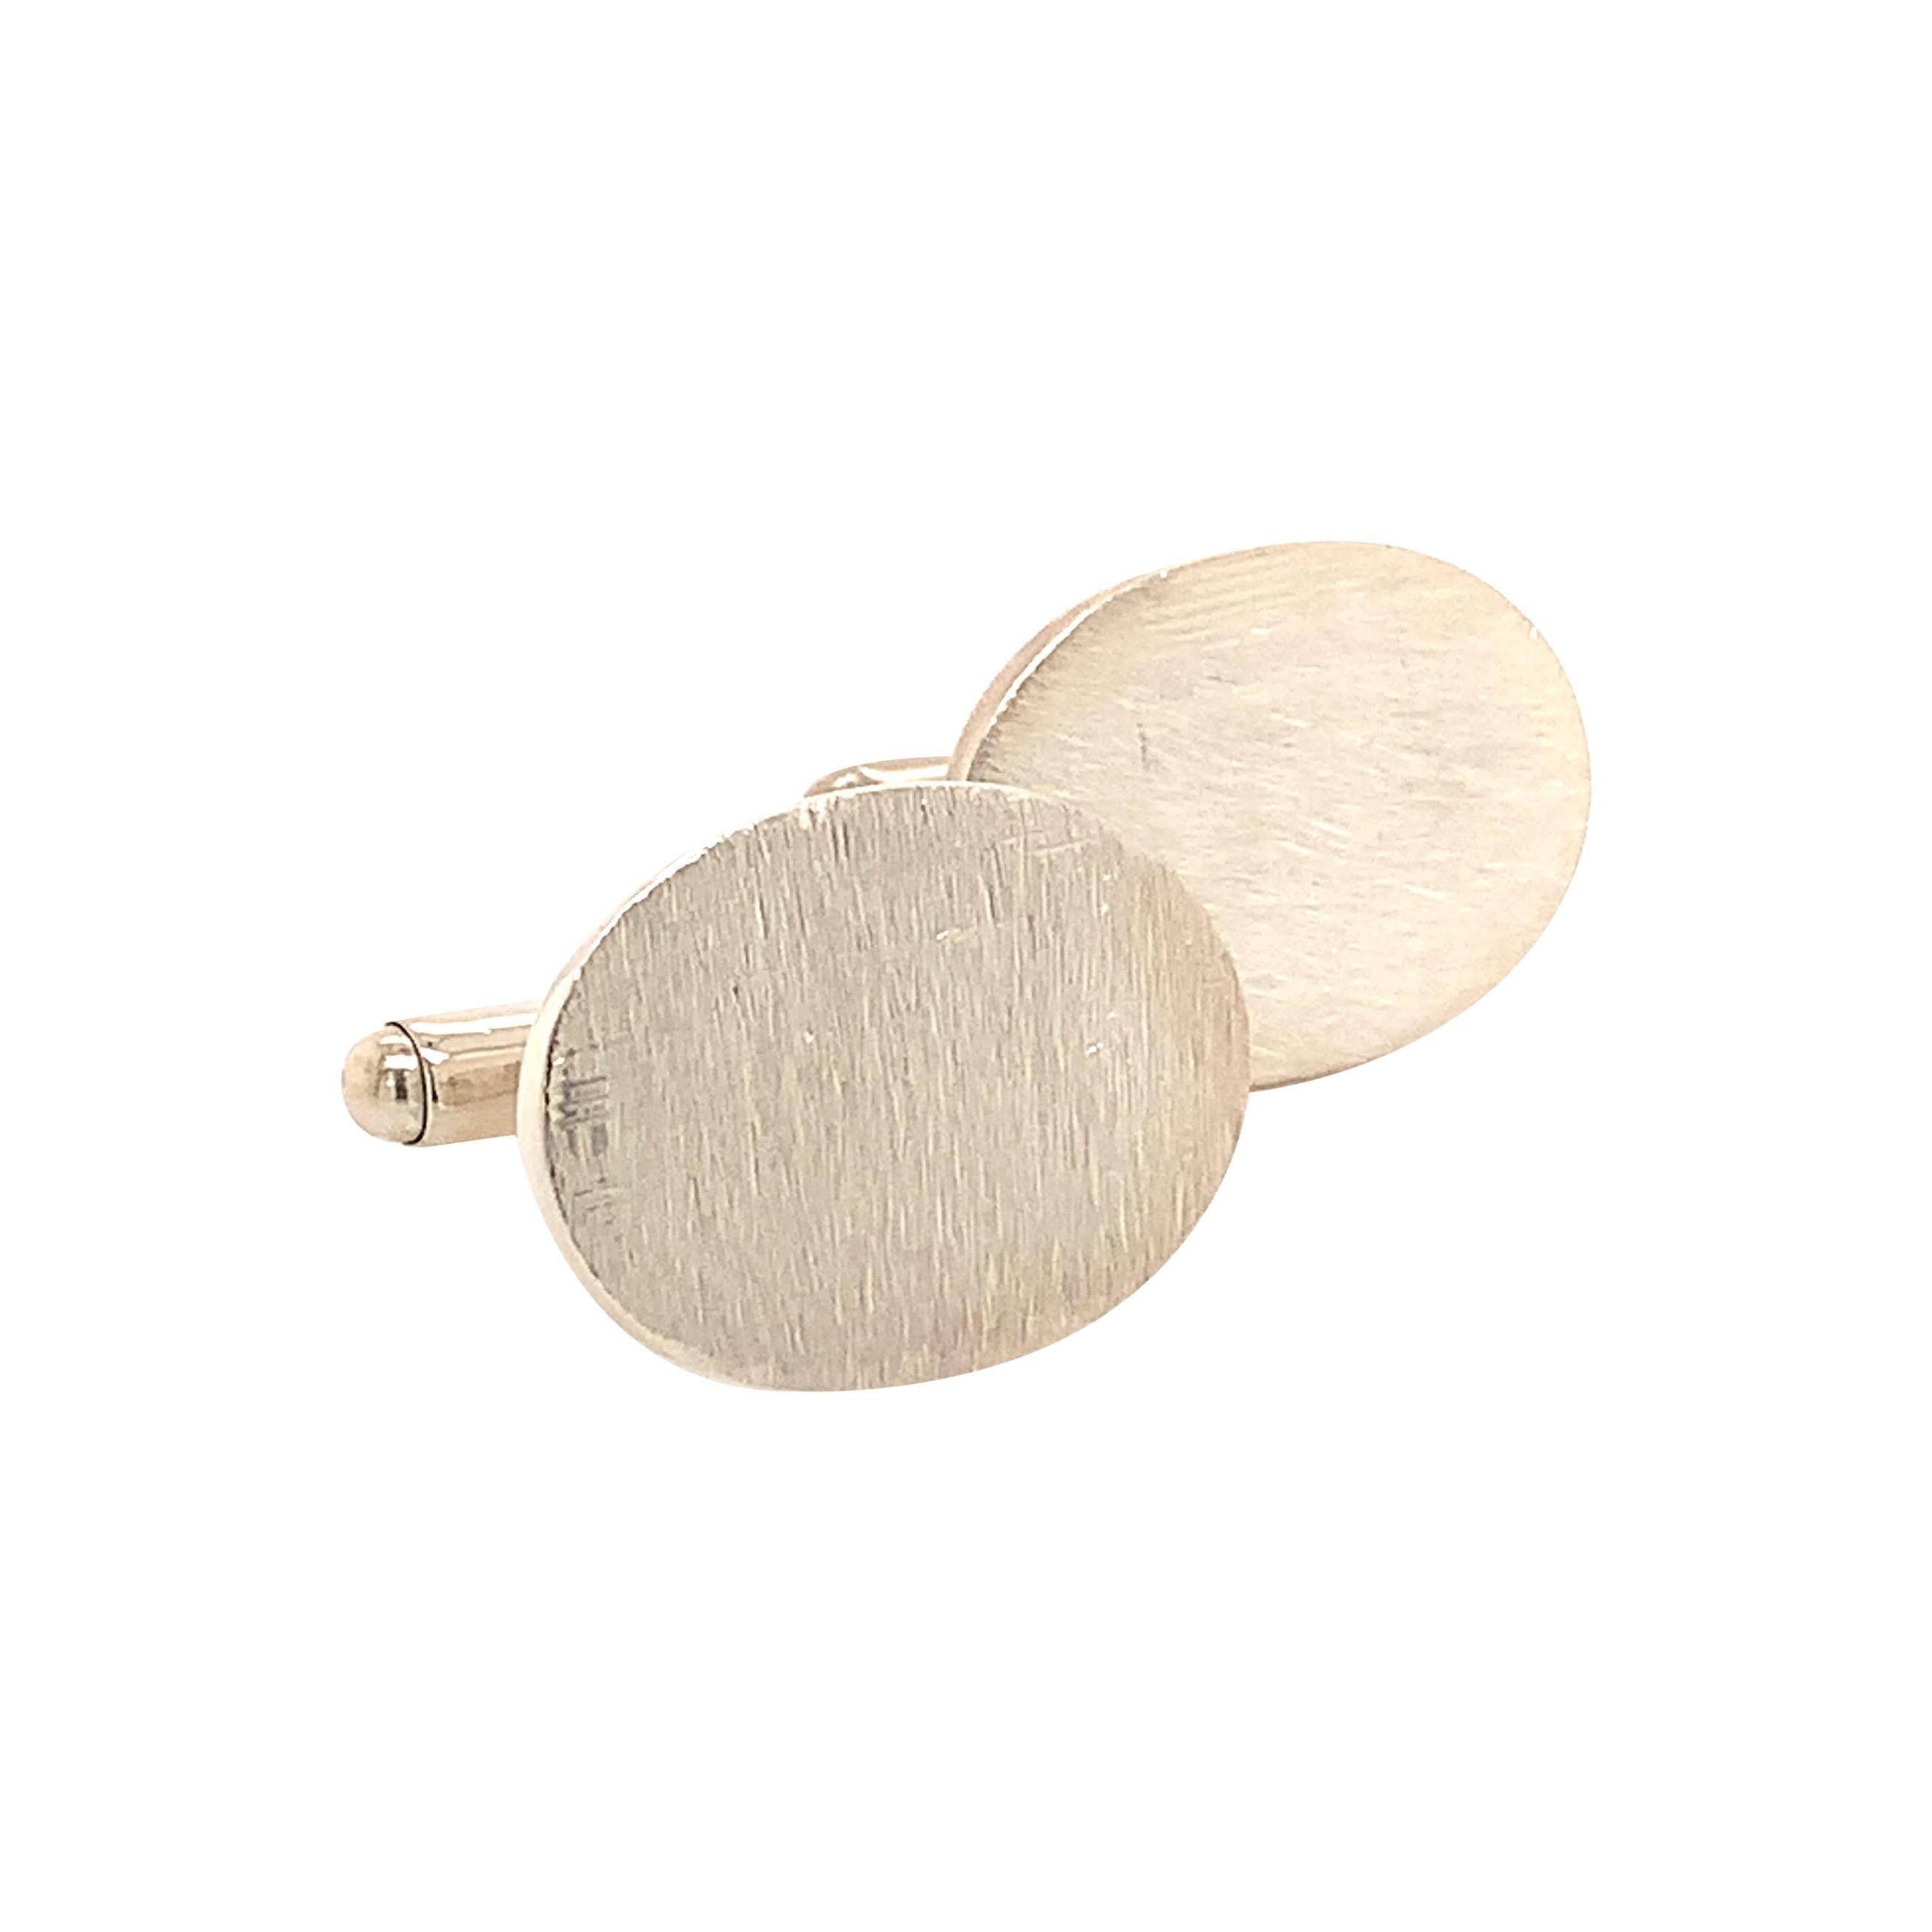 Tiffany & Co. Estate Cufflinks Sterling Silver 925 15.3 Grams